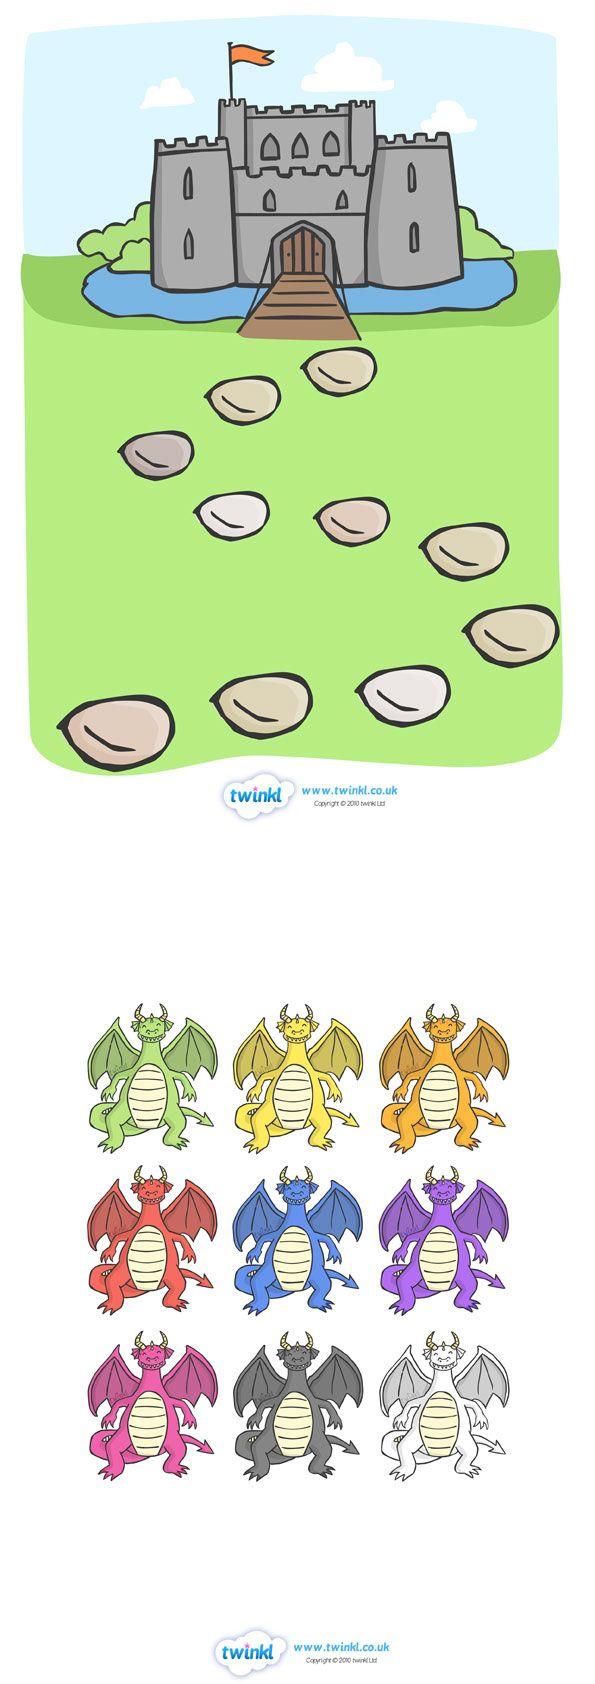 Kindergarten classroom decoration printables - Twinkl Resources Dragon Reward Chart Classroom Printables For Pre School Kindergarten Elementary School And Beyond